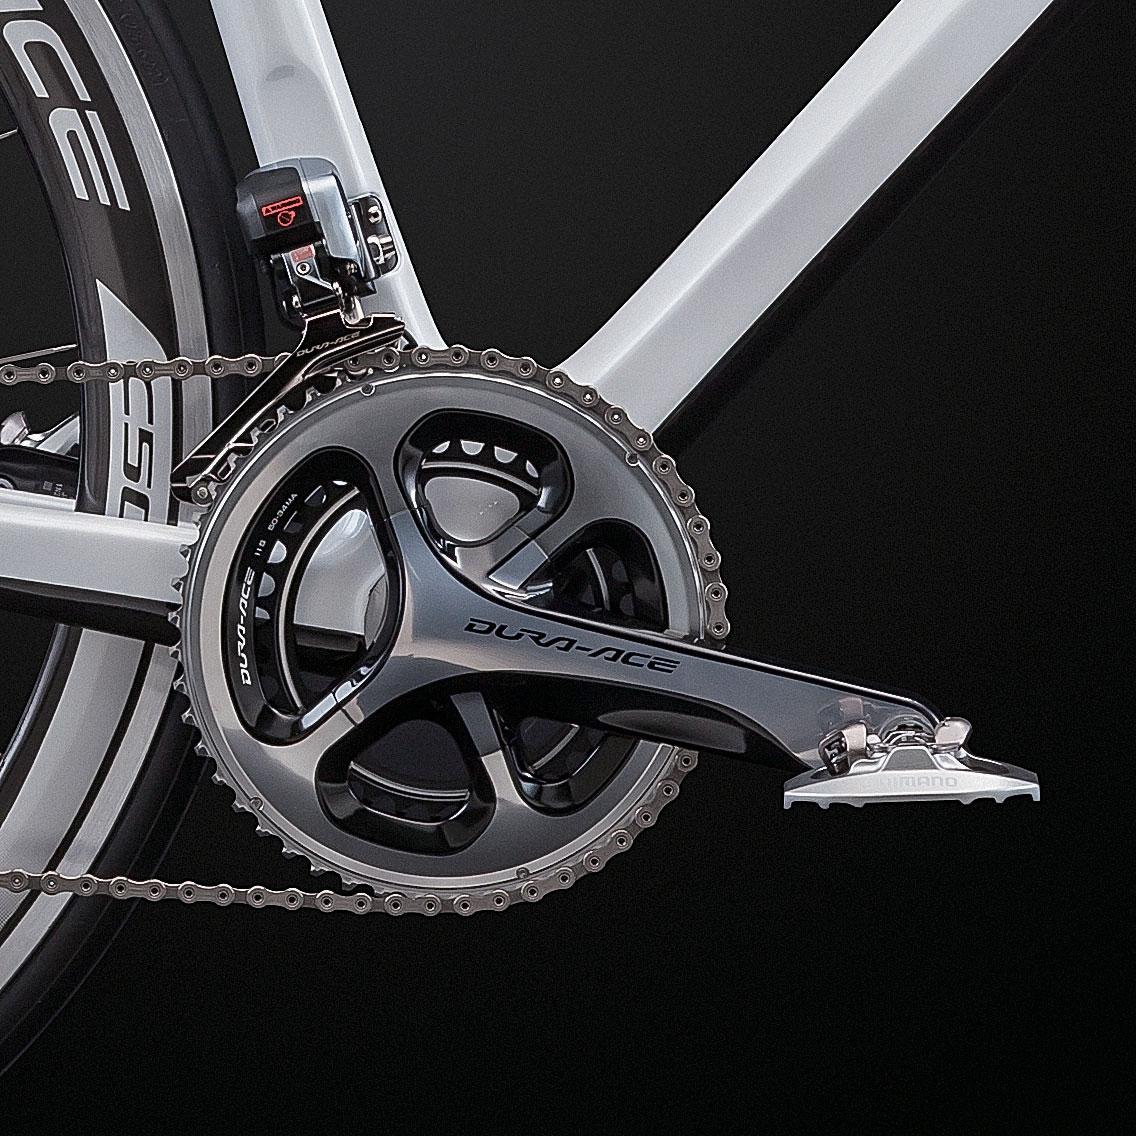 Used Lexus For Sale In Ct >> The Lexus F SPORT Carbon Fiber Road Bicycle | Lexus Enthusiast